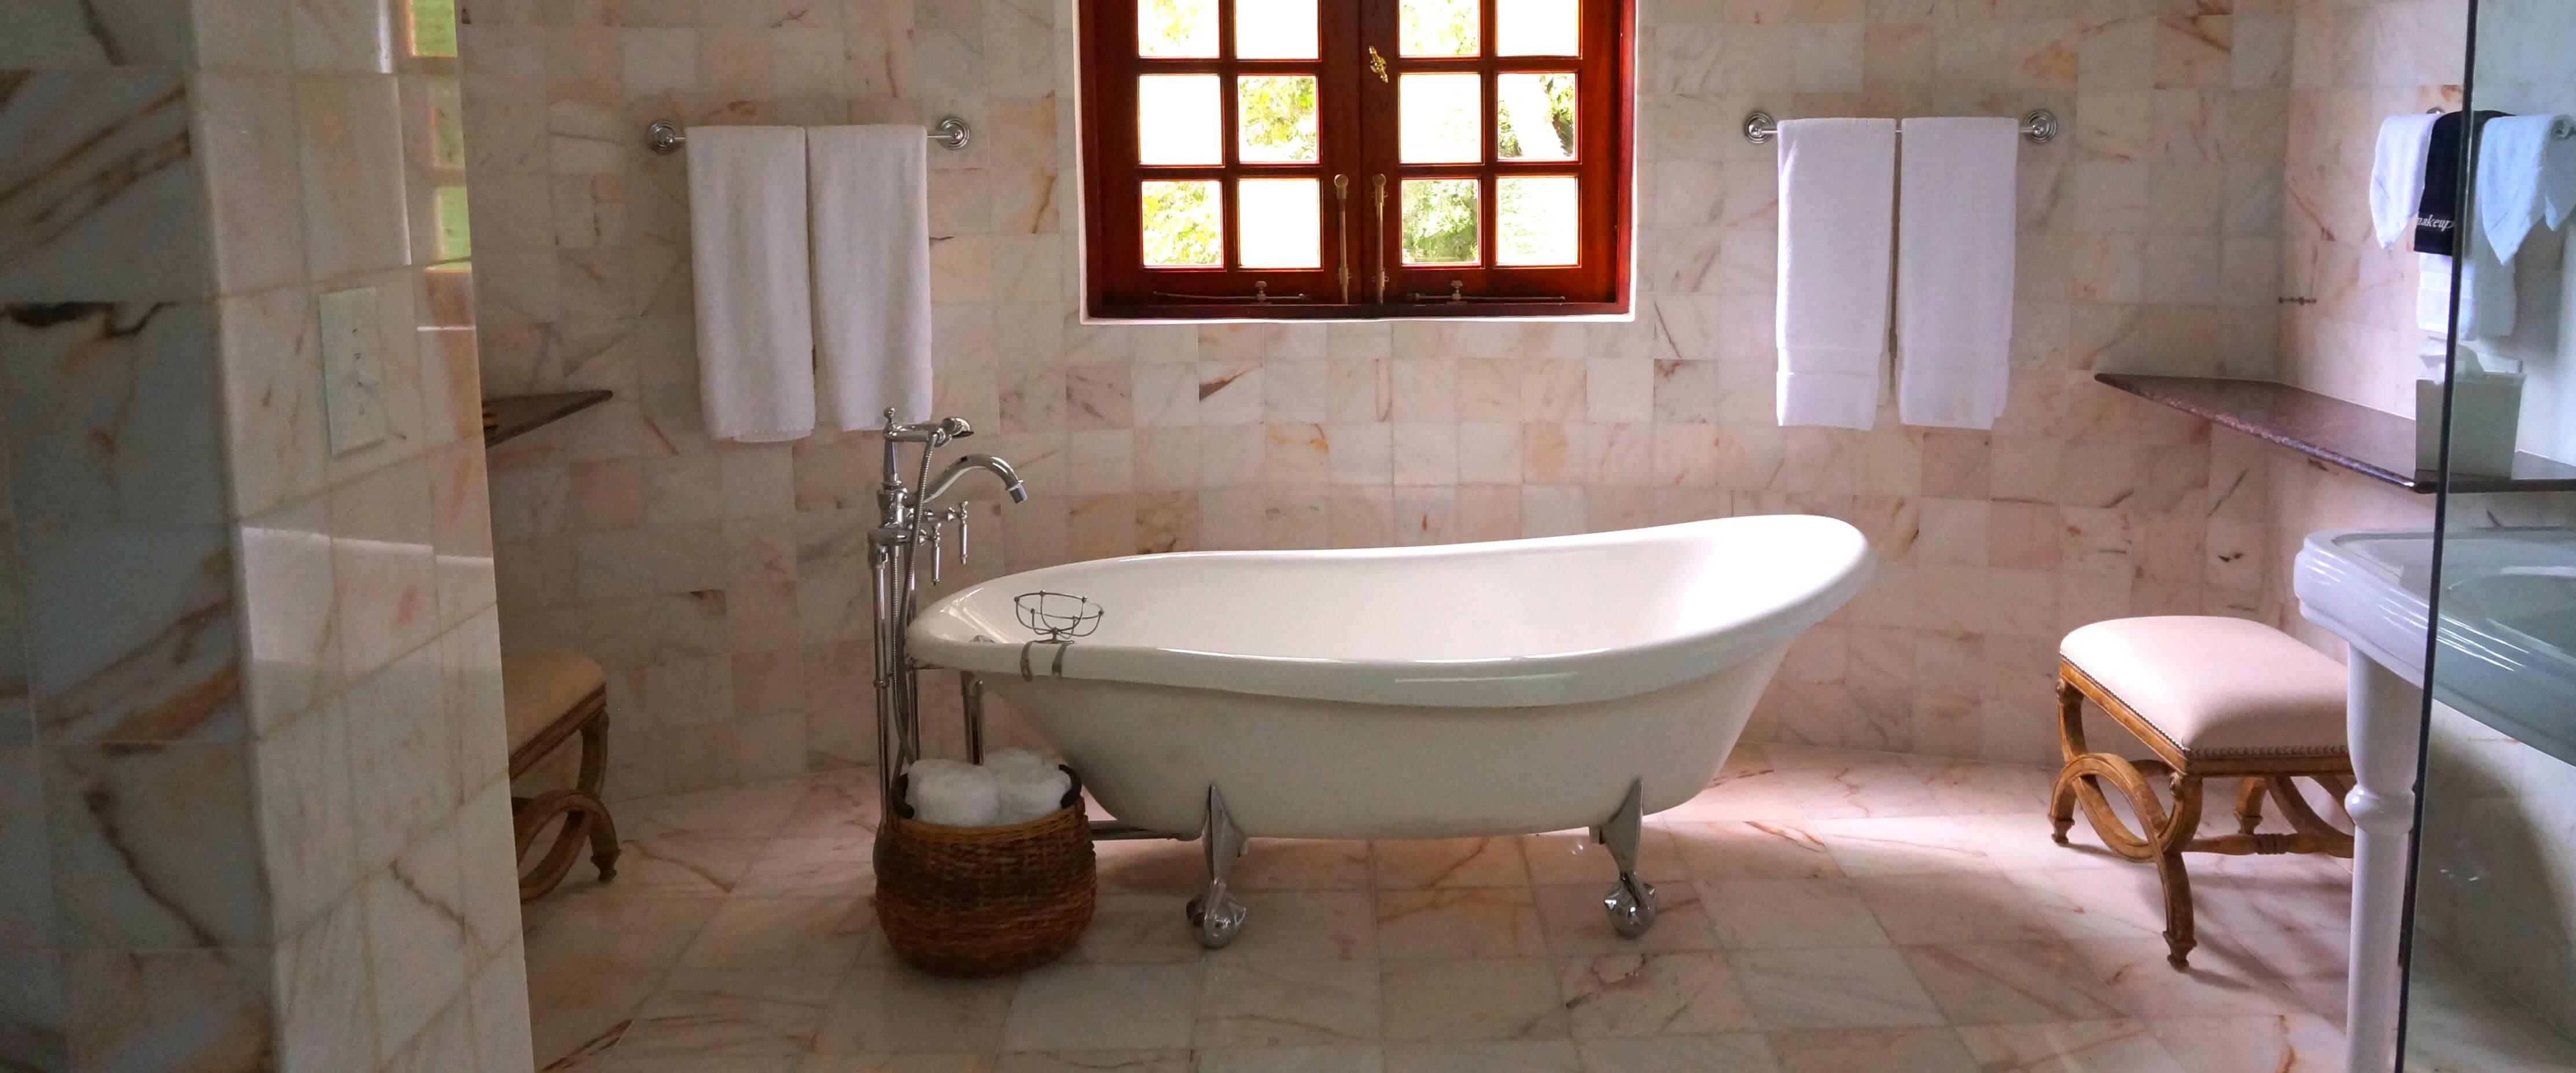 http://www.bathtubdoctor.com/wp-content/uploads/2017/01/3.jpg